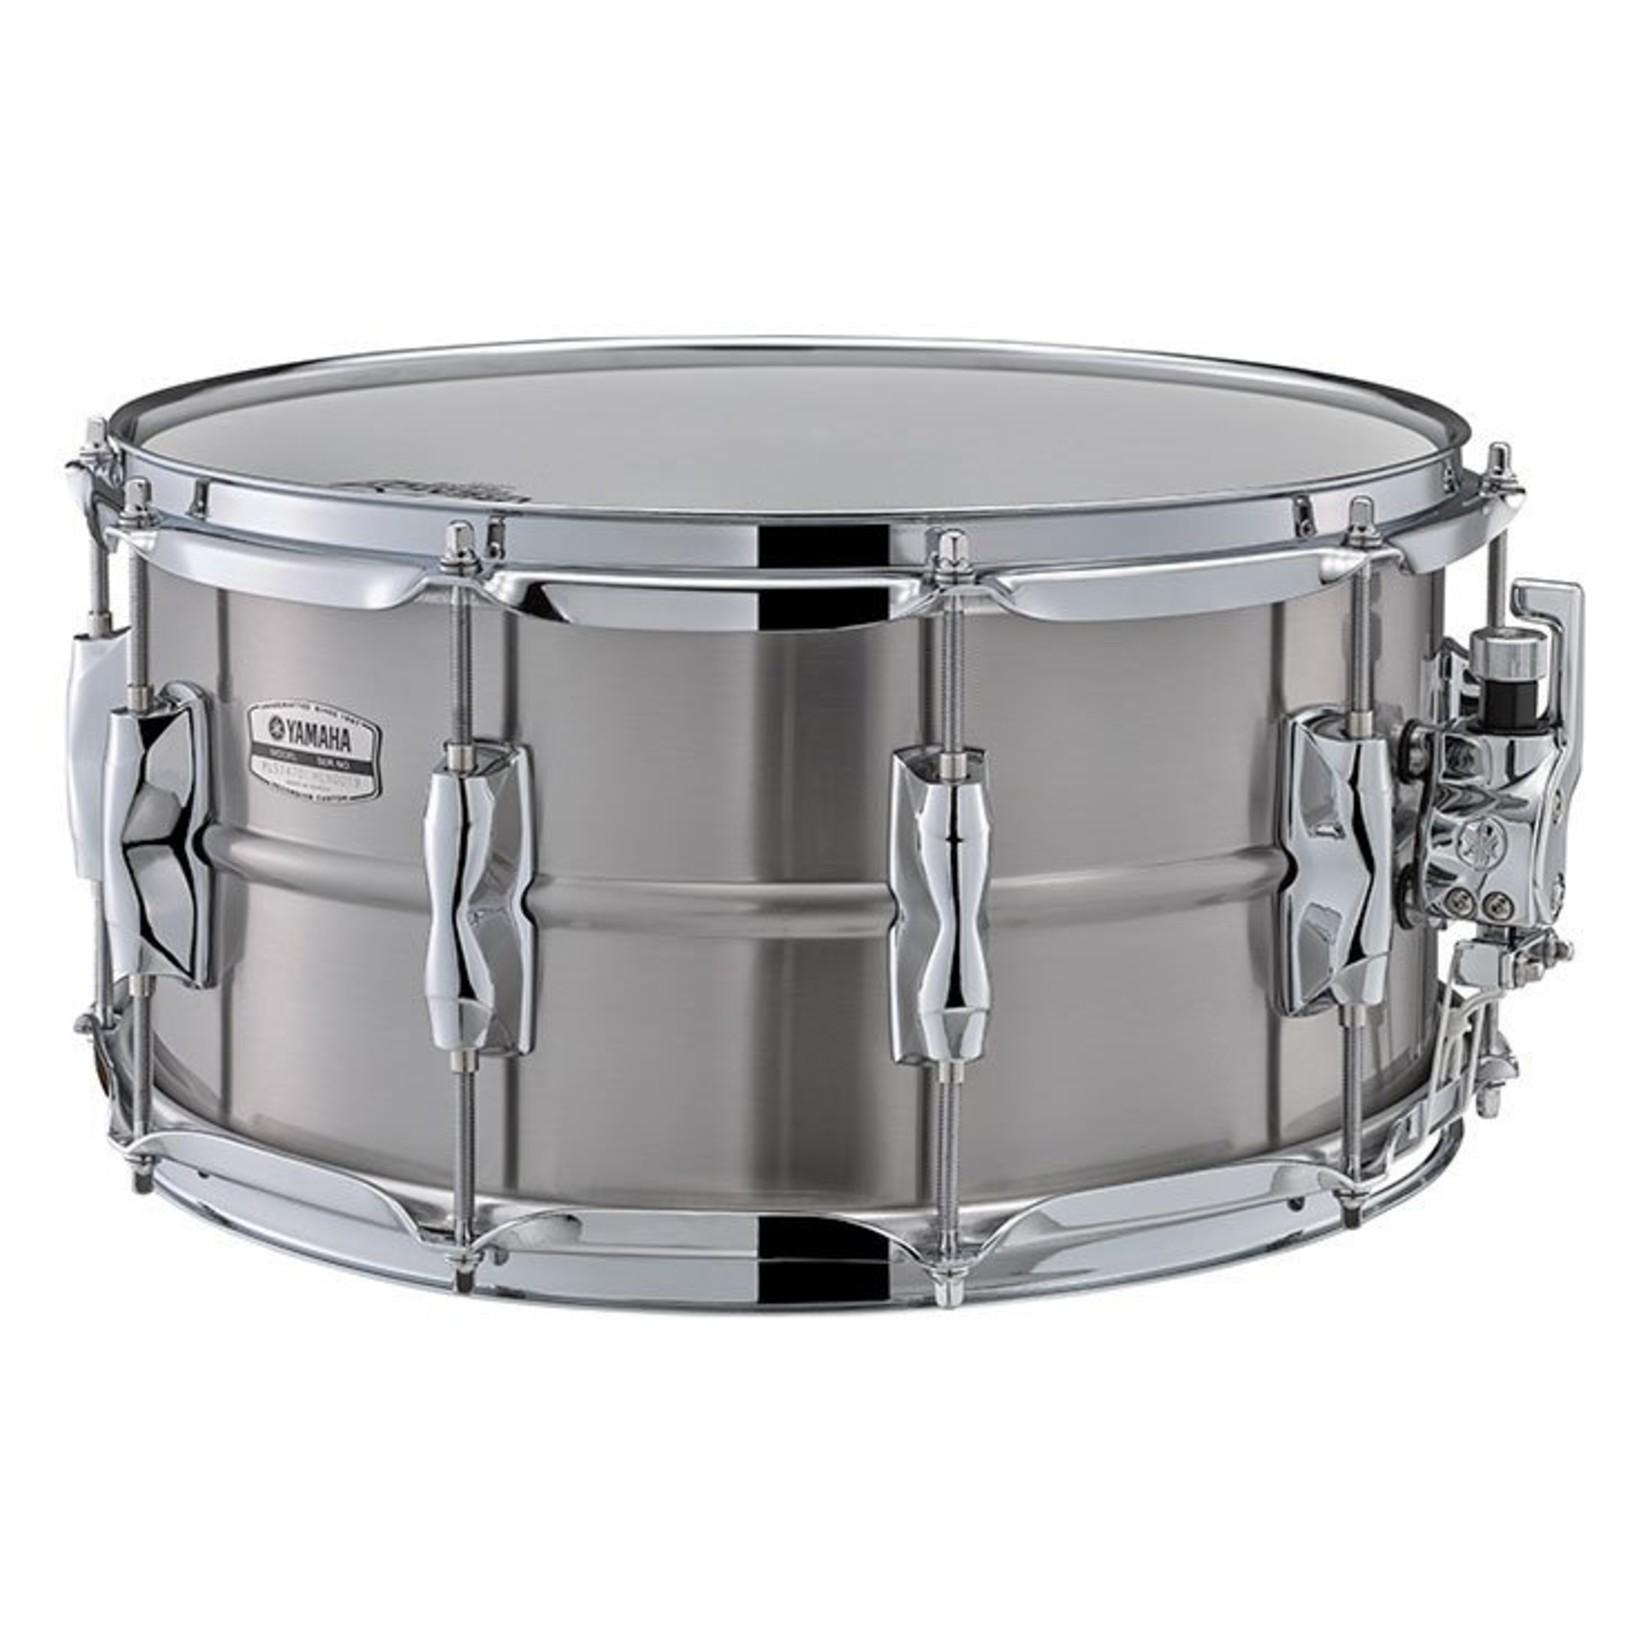 "Yamaha Yamaha 7x14 Recording Custom Snare Drum ""Stainless Steel"""